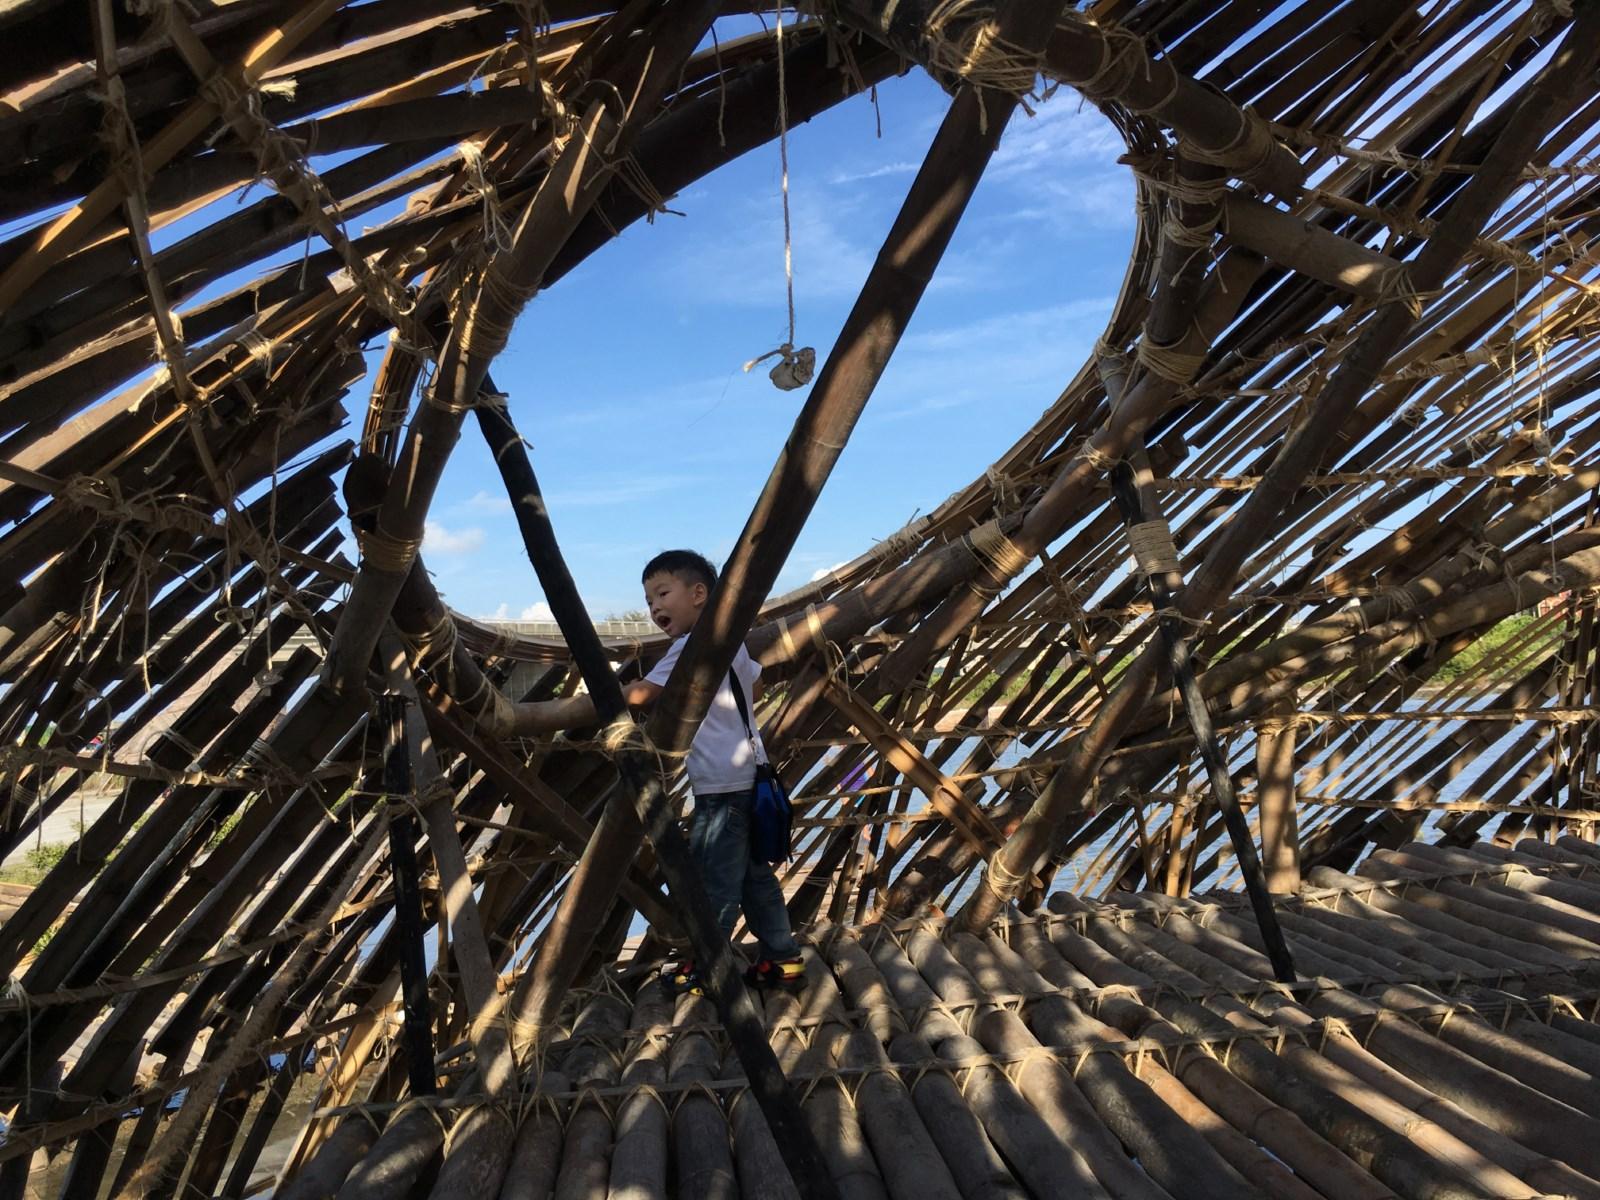 Chenglong shelter 13 [1600x1200]